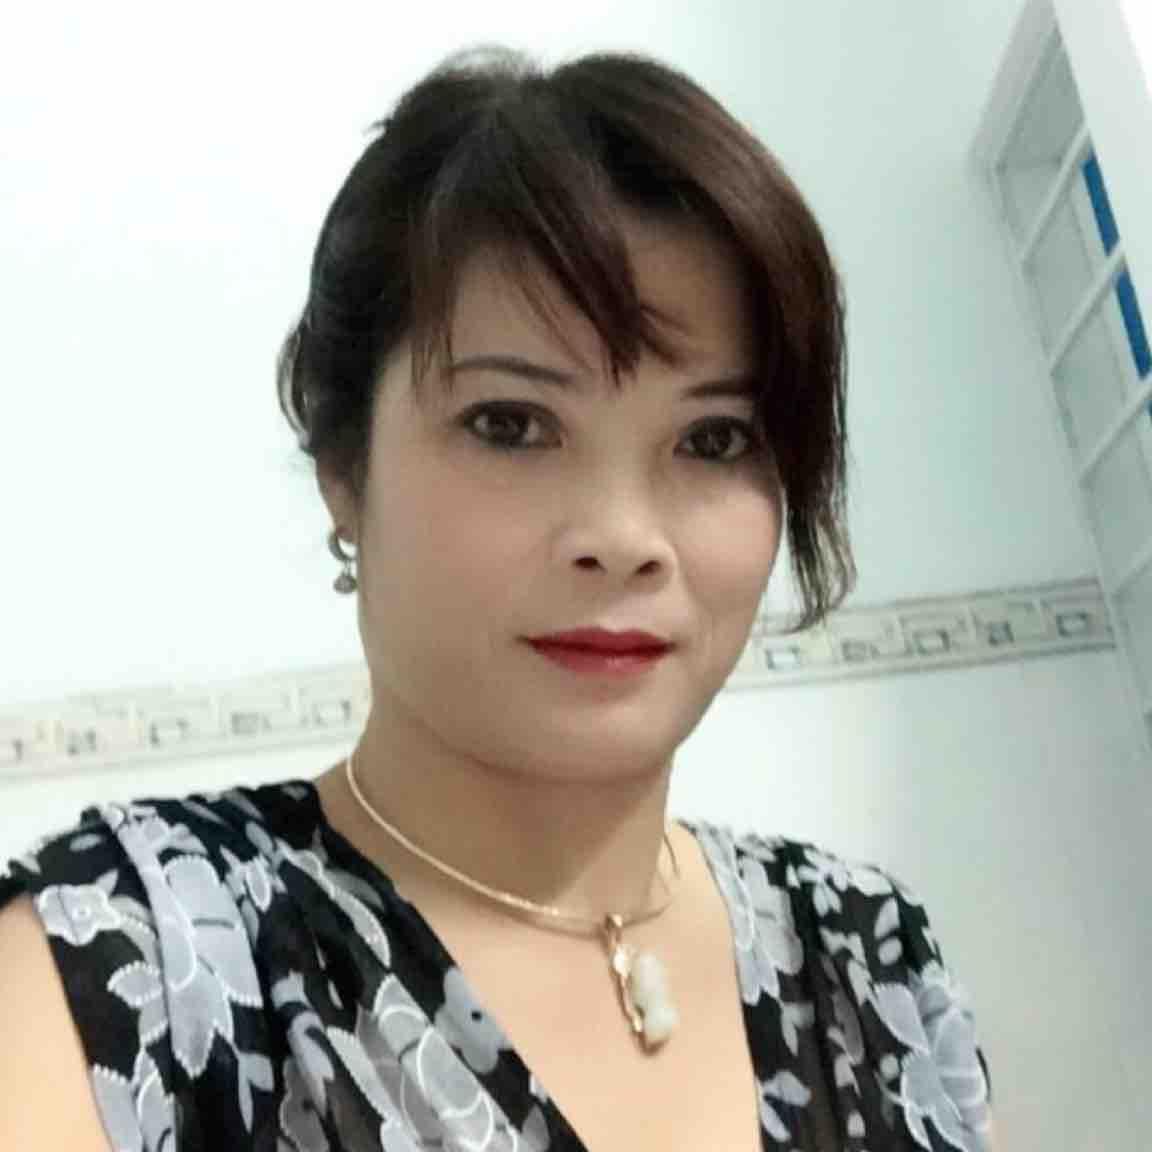 Sầu Lẻ Bóng (Karaoke Beat) - Tone Nữ